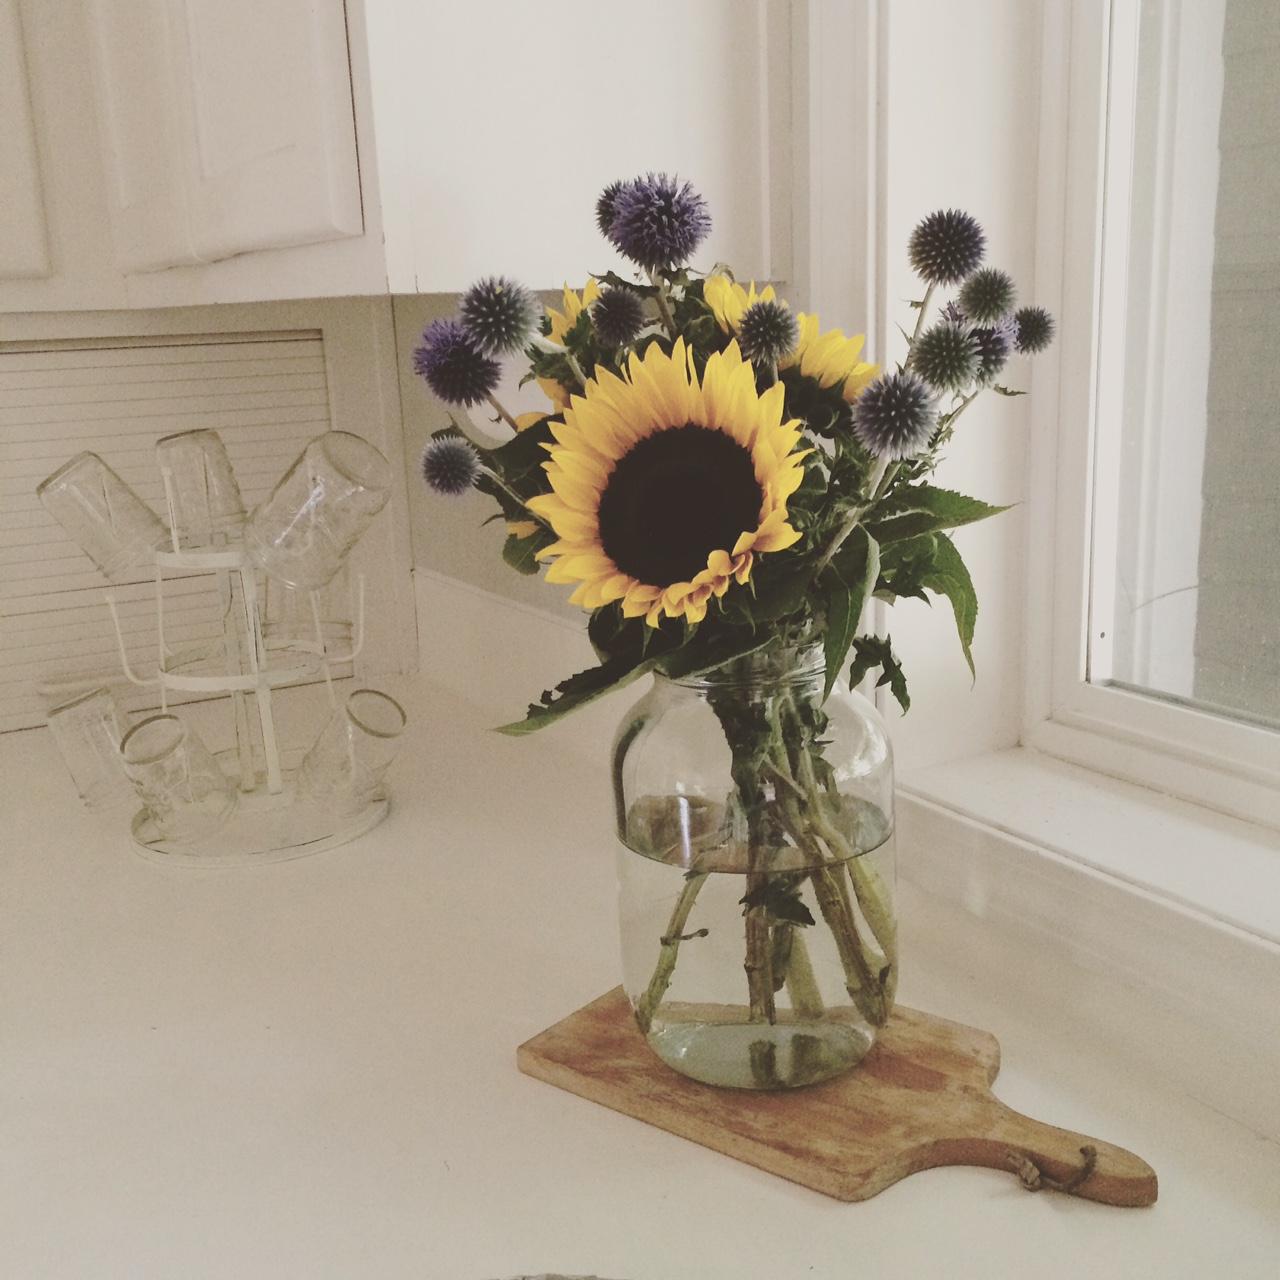 Little Farmstead Farmhouse Flowers A New Favorite Sign